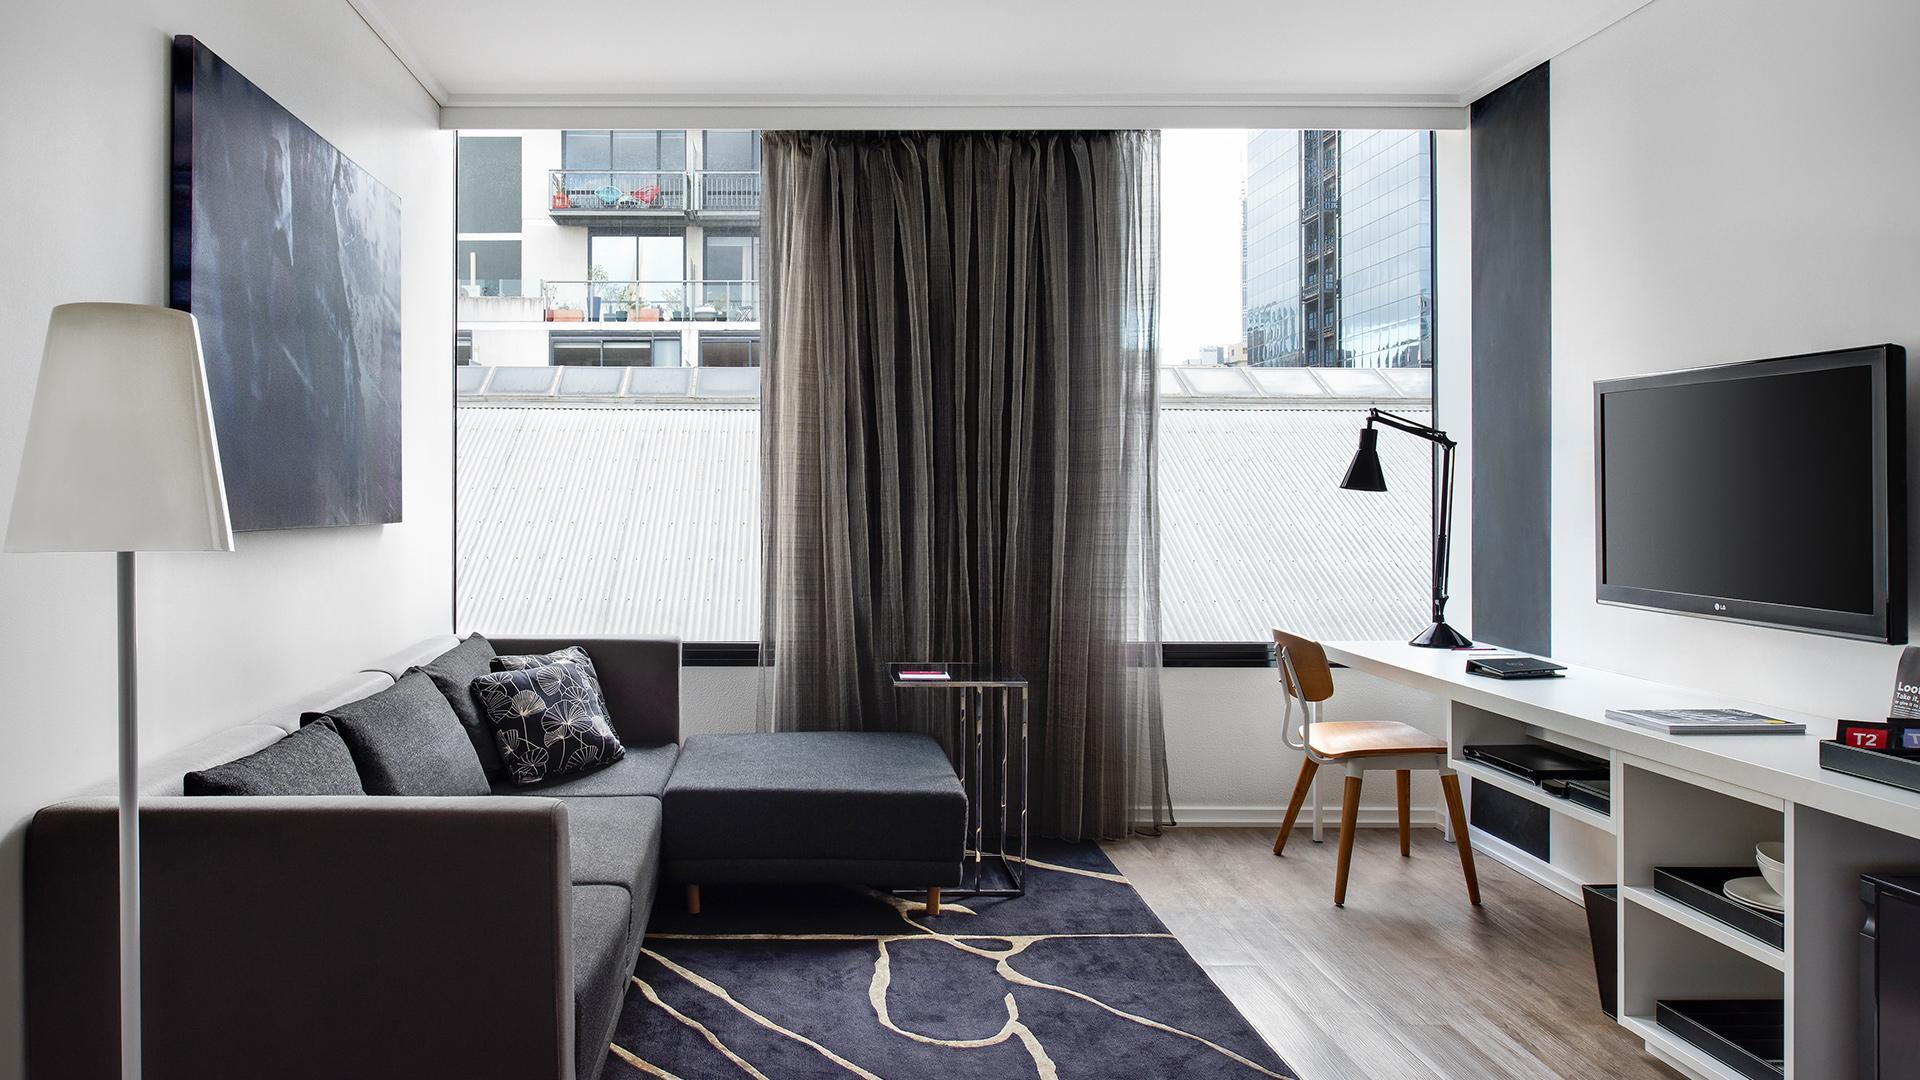 Studio Suite image 1 at Ovolo Laneways by Melbourne City, Victoria, Australia